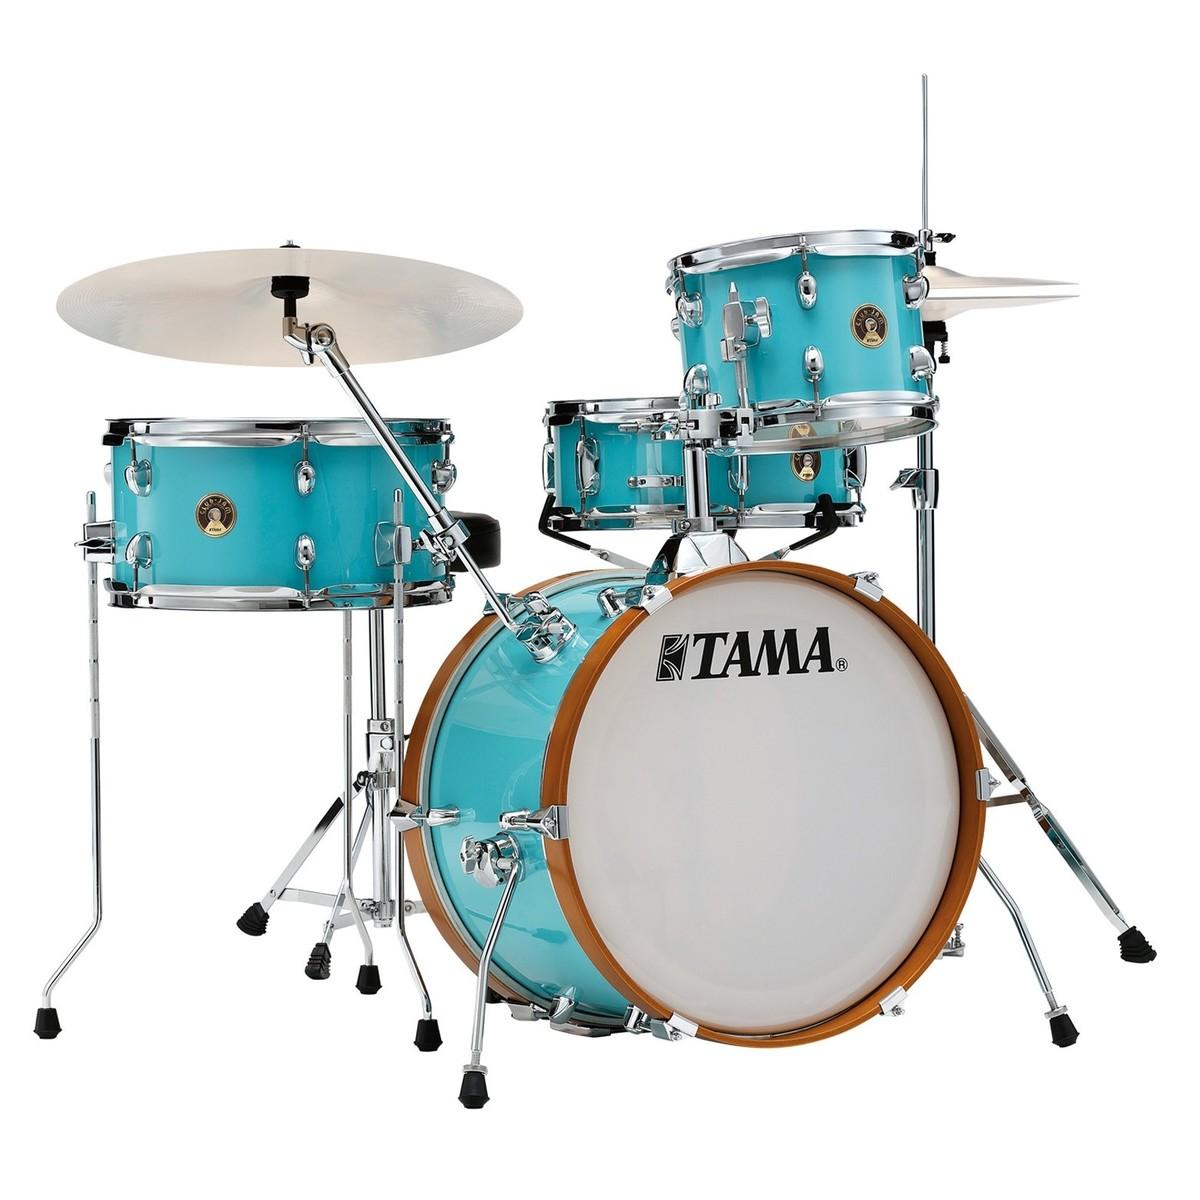 Zz Top Drummer Frank Beard Drum Kit